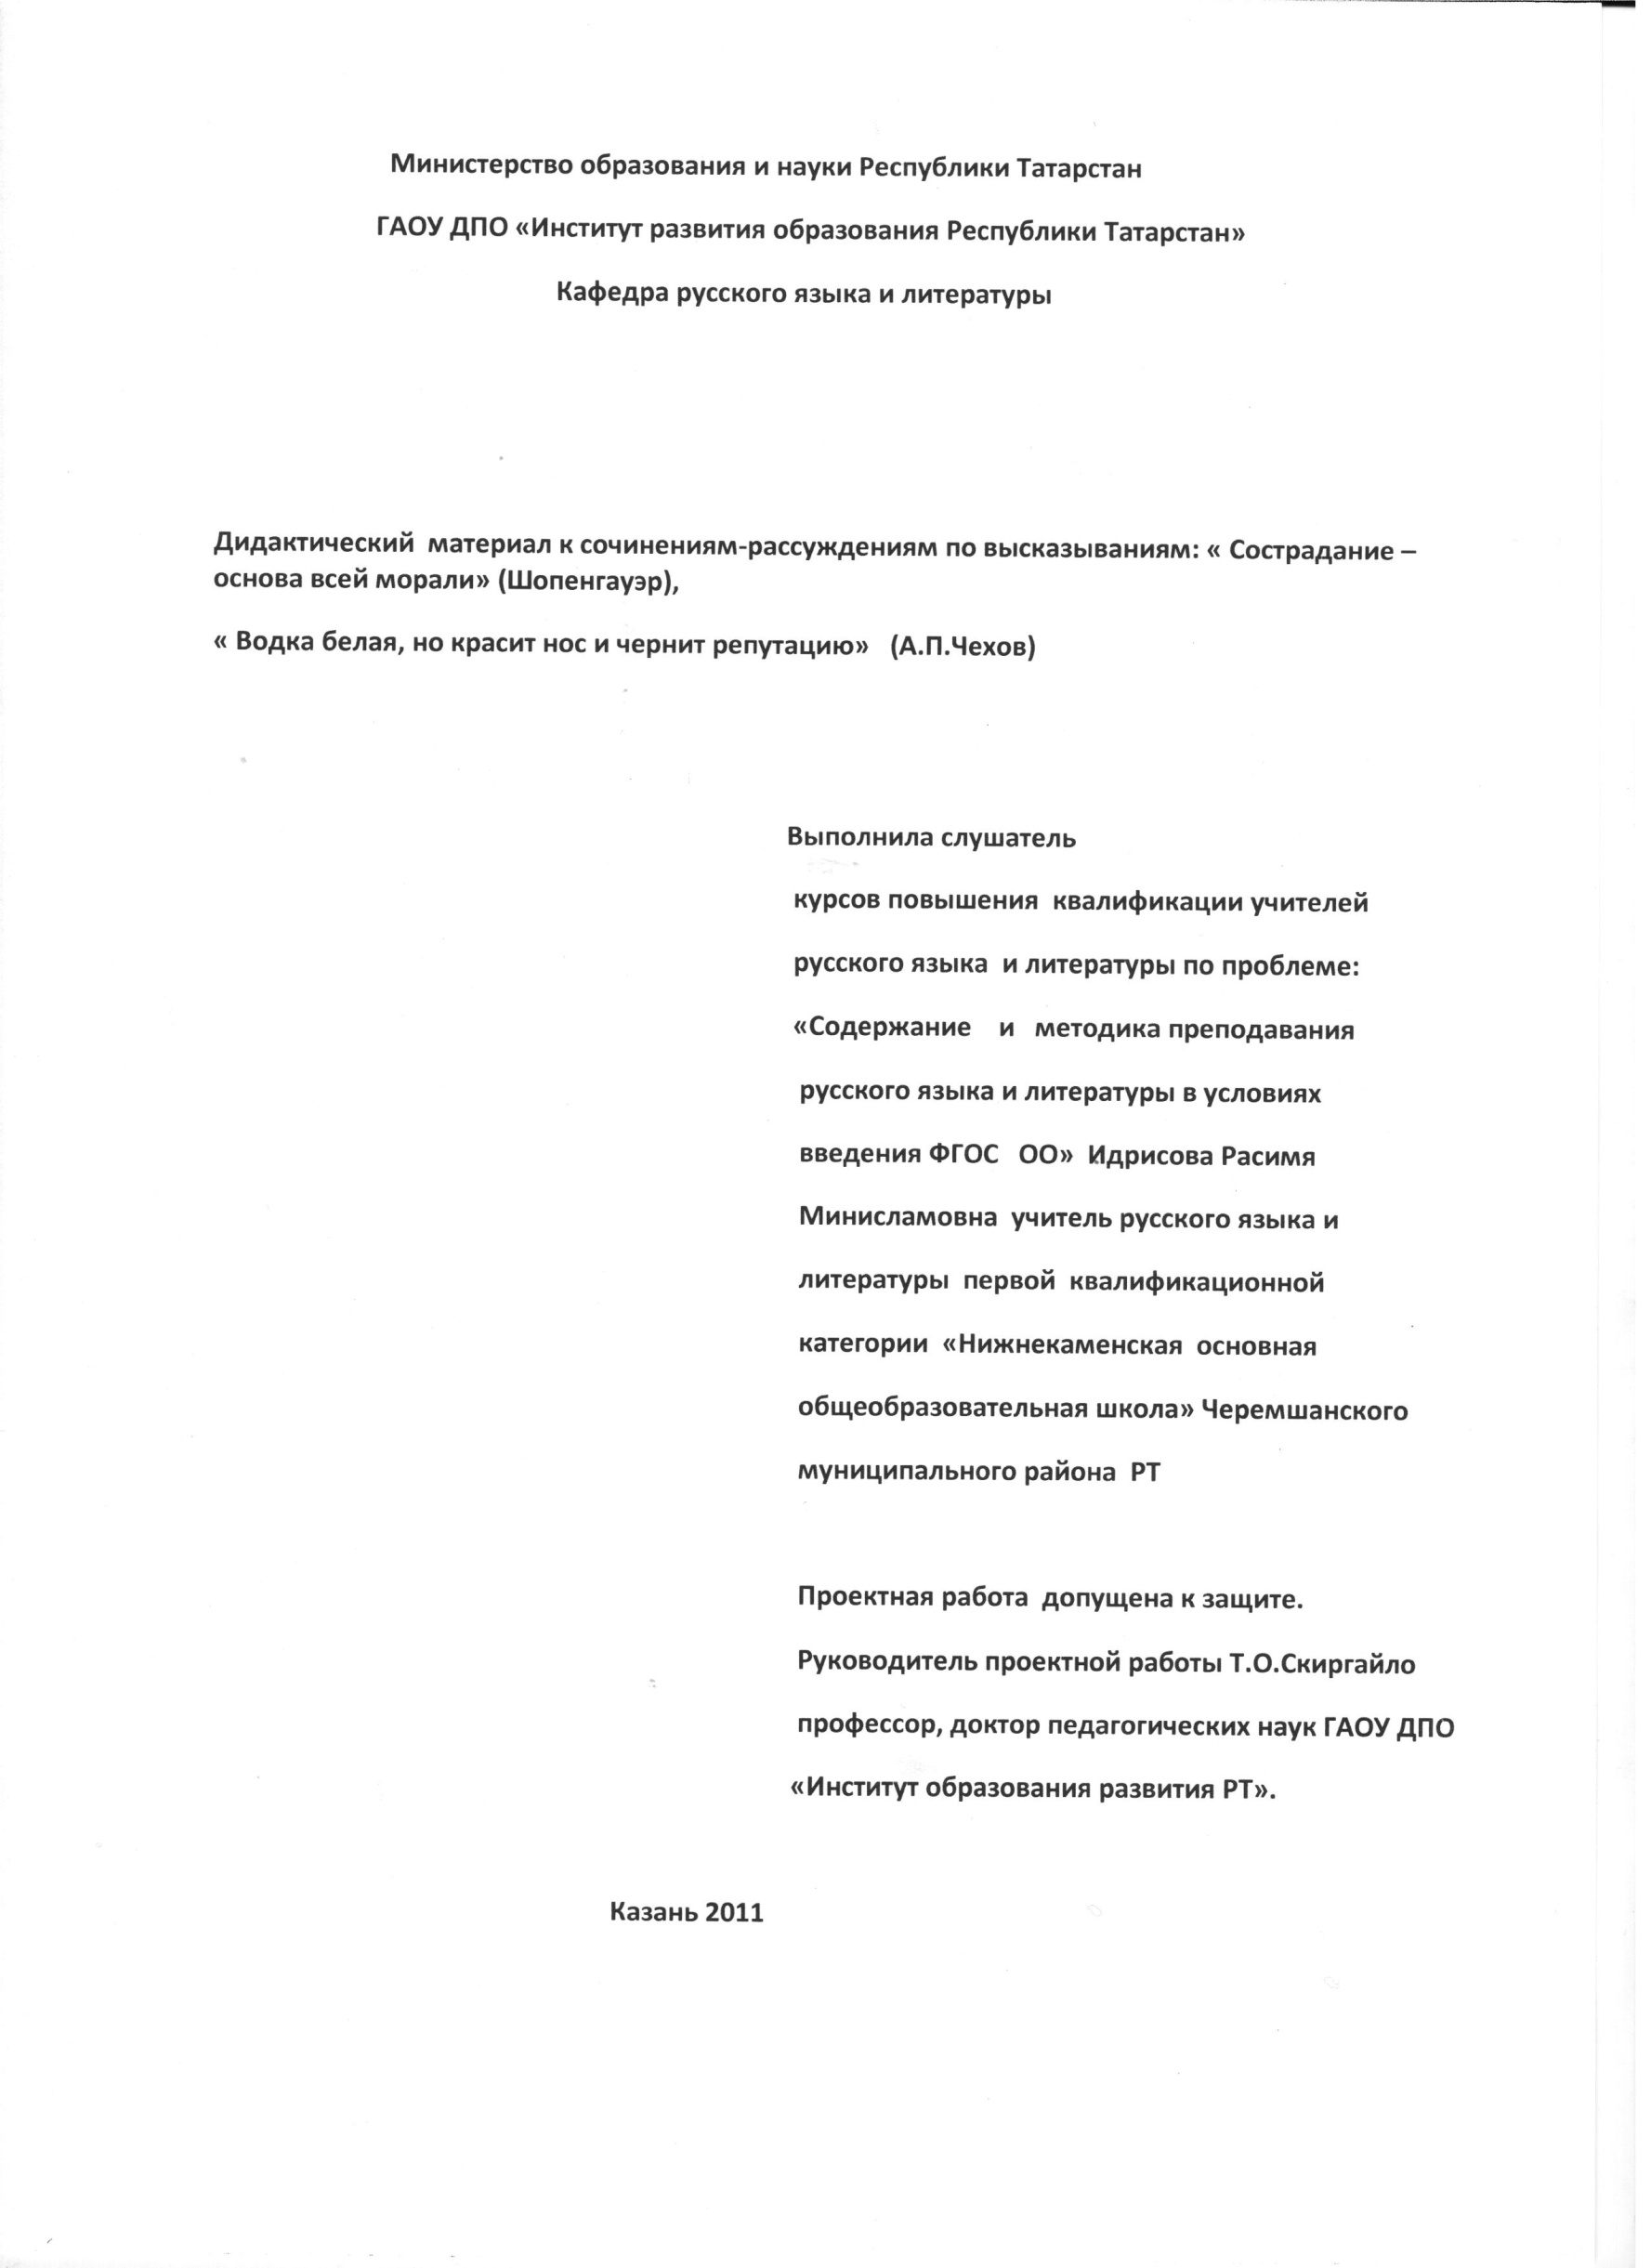 C:\Documents and Settings\Admin\Мои документы\Мои рисунки\Изображение 005.jpg